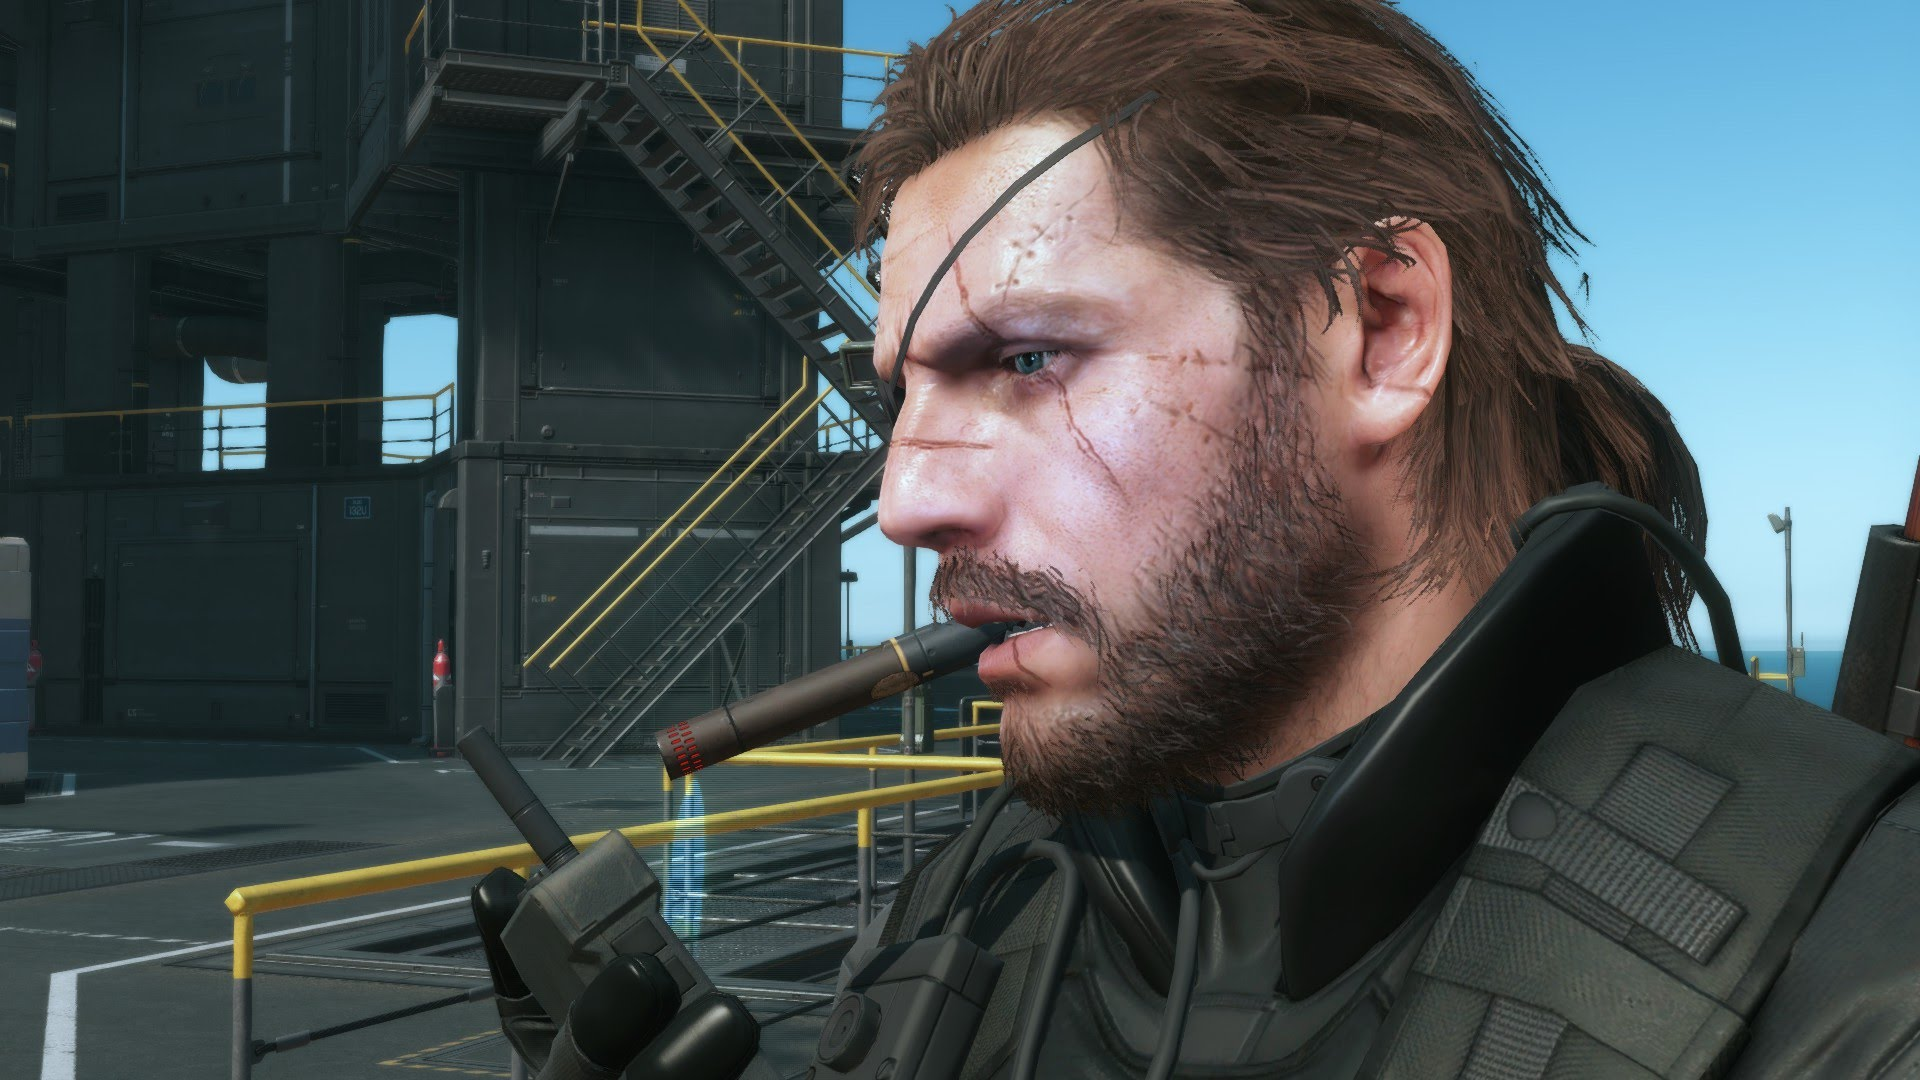 maxresdefault.jpg - Metal Gear Solid 5: The Phantom Pain